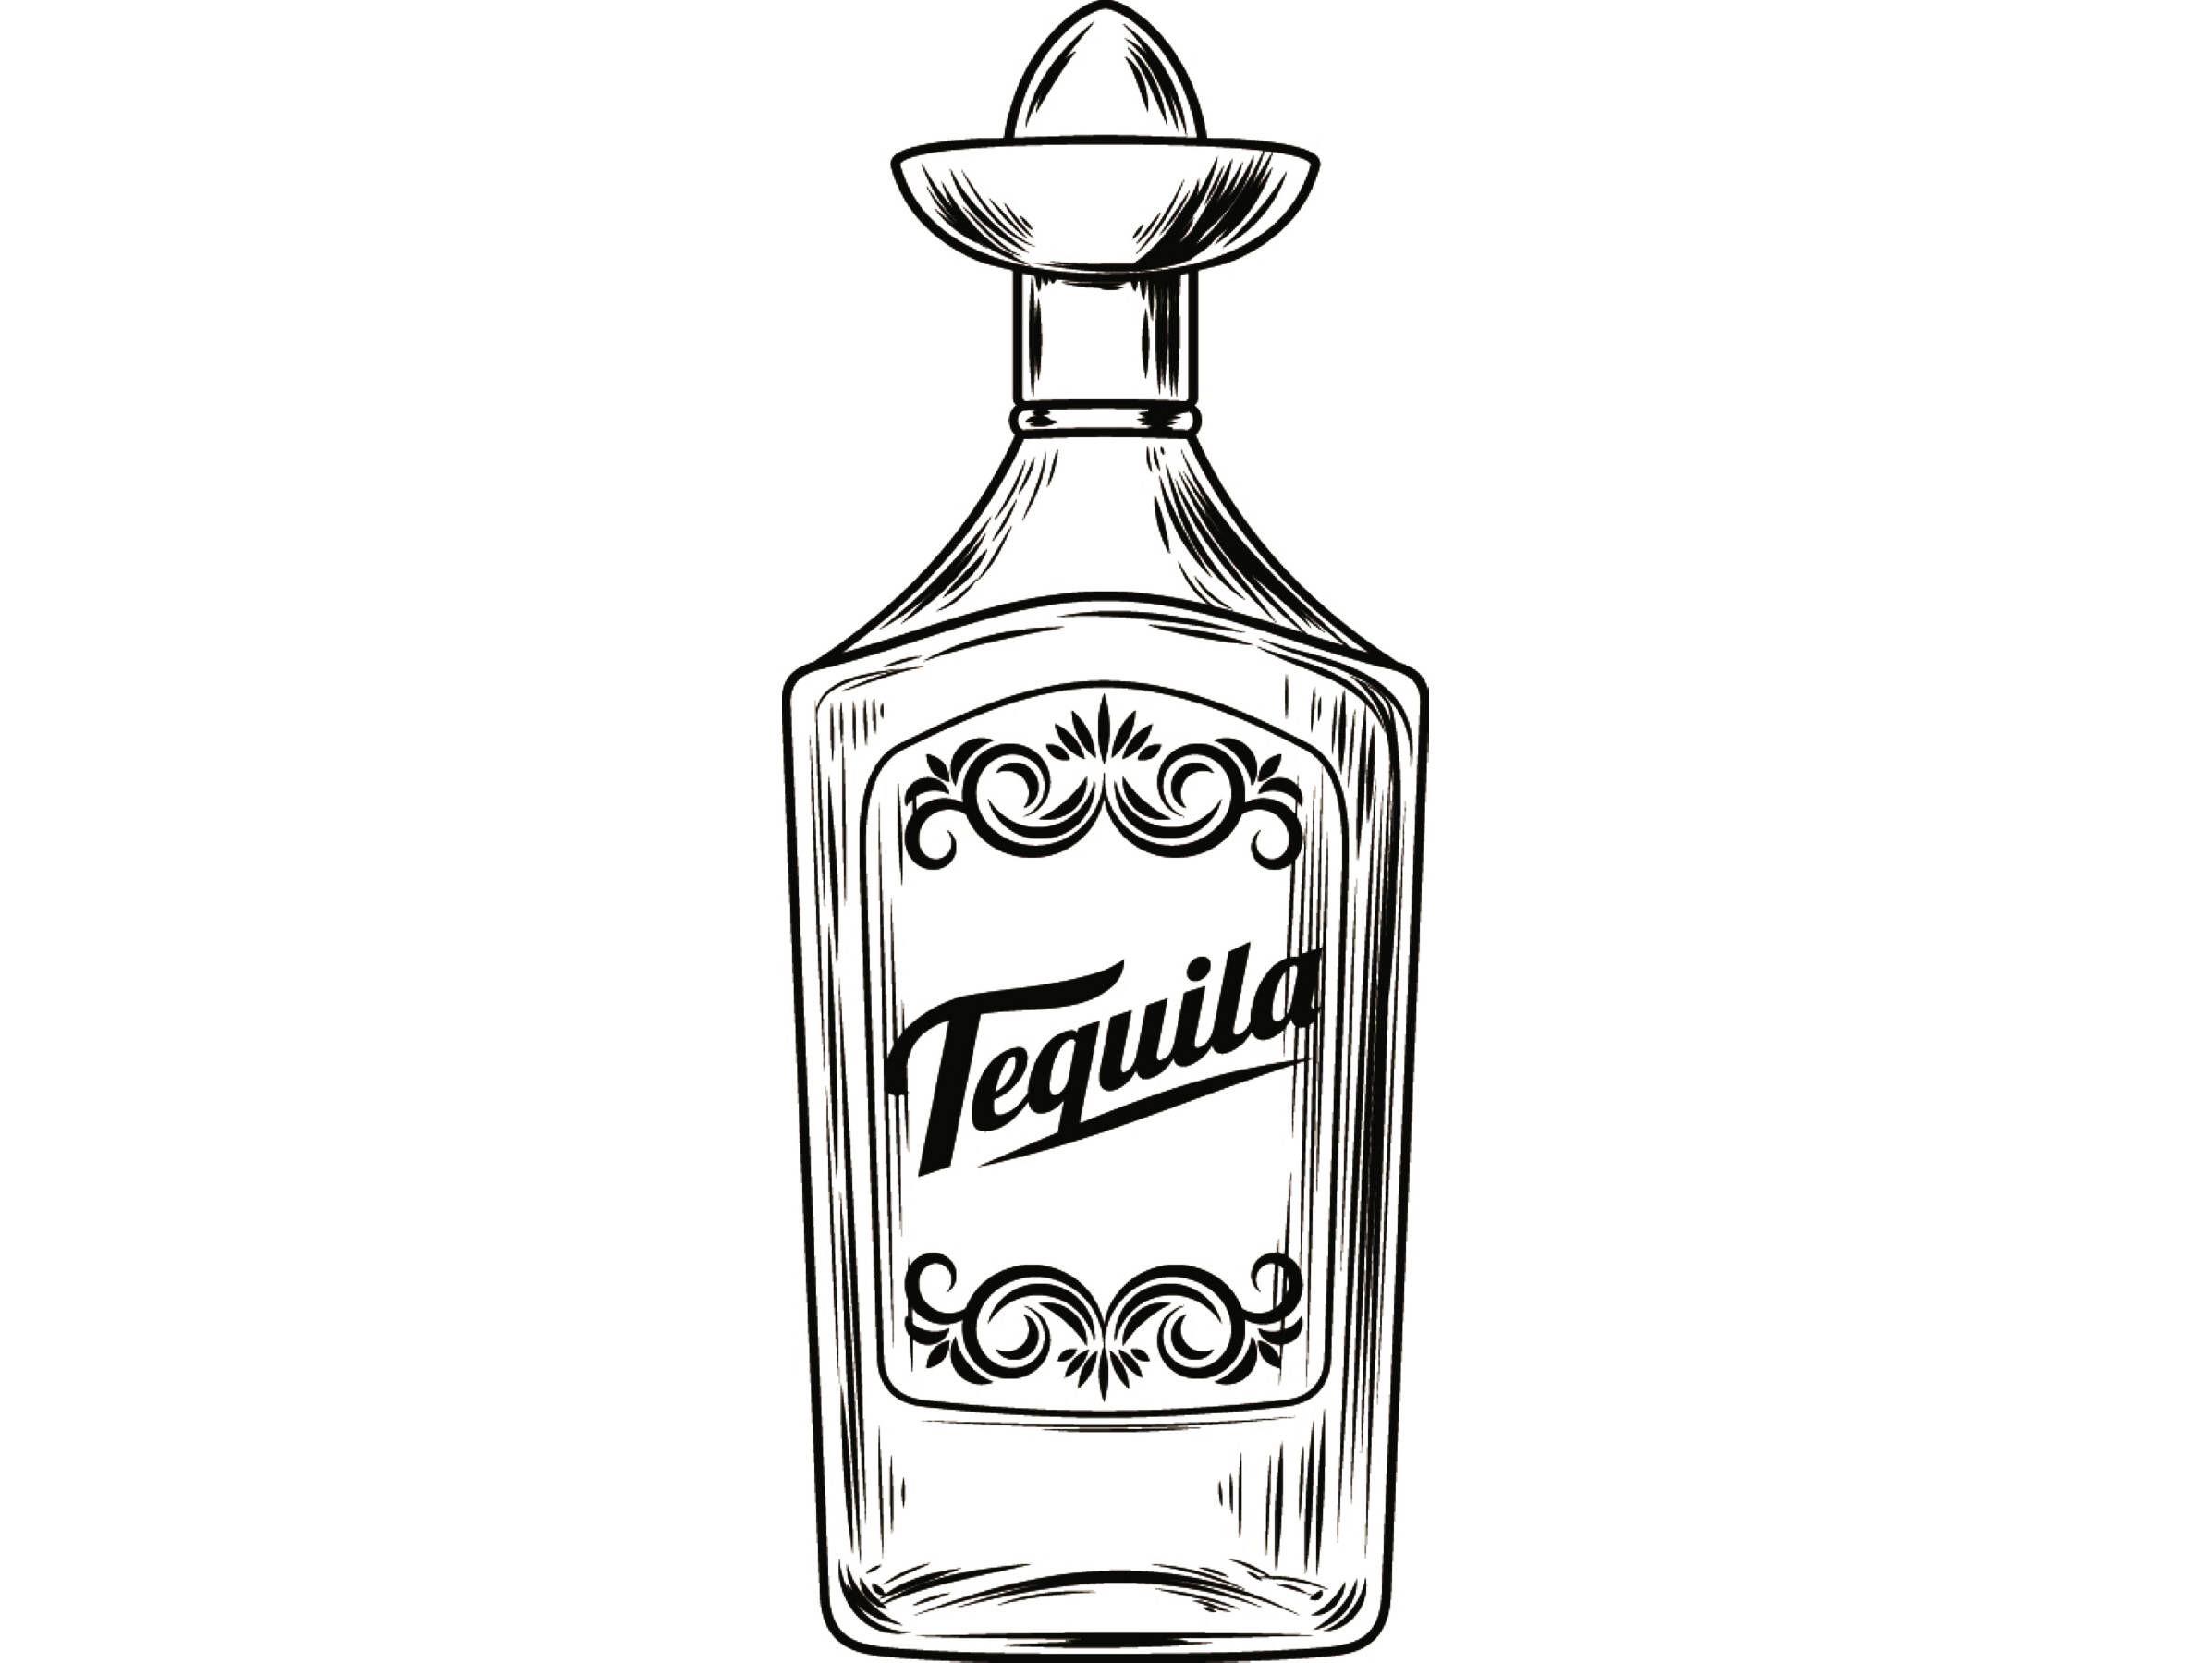 Alcohol Bottle 2 Tequila Liquor Sombrero Drink Drinking Cocktail Bar Pub Bartender Vintage Glass Svg Eps Png Vector C Tequila Bottles Bottle Tattoo Tequila